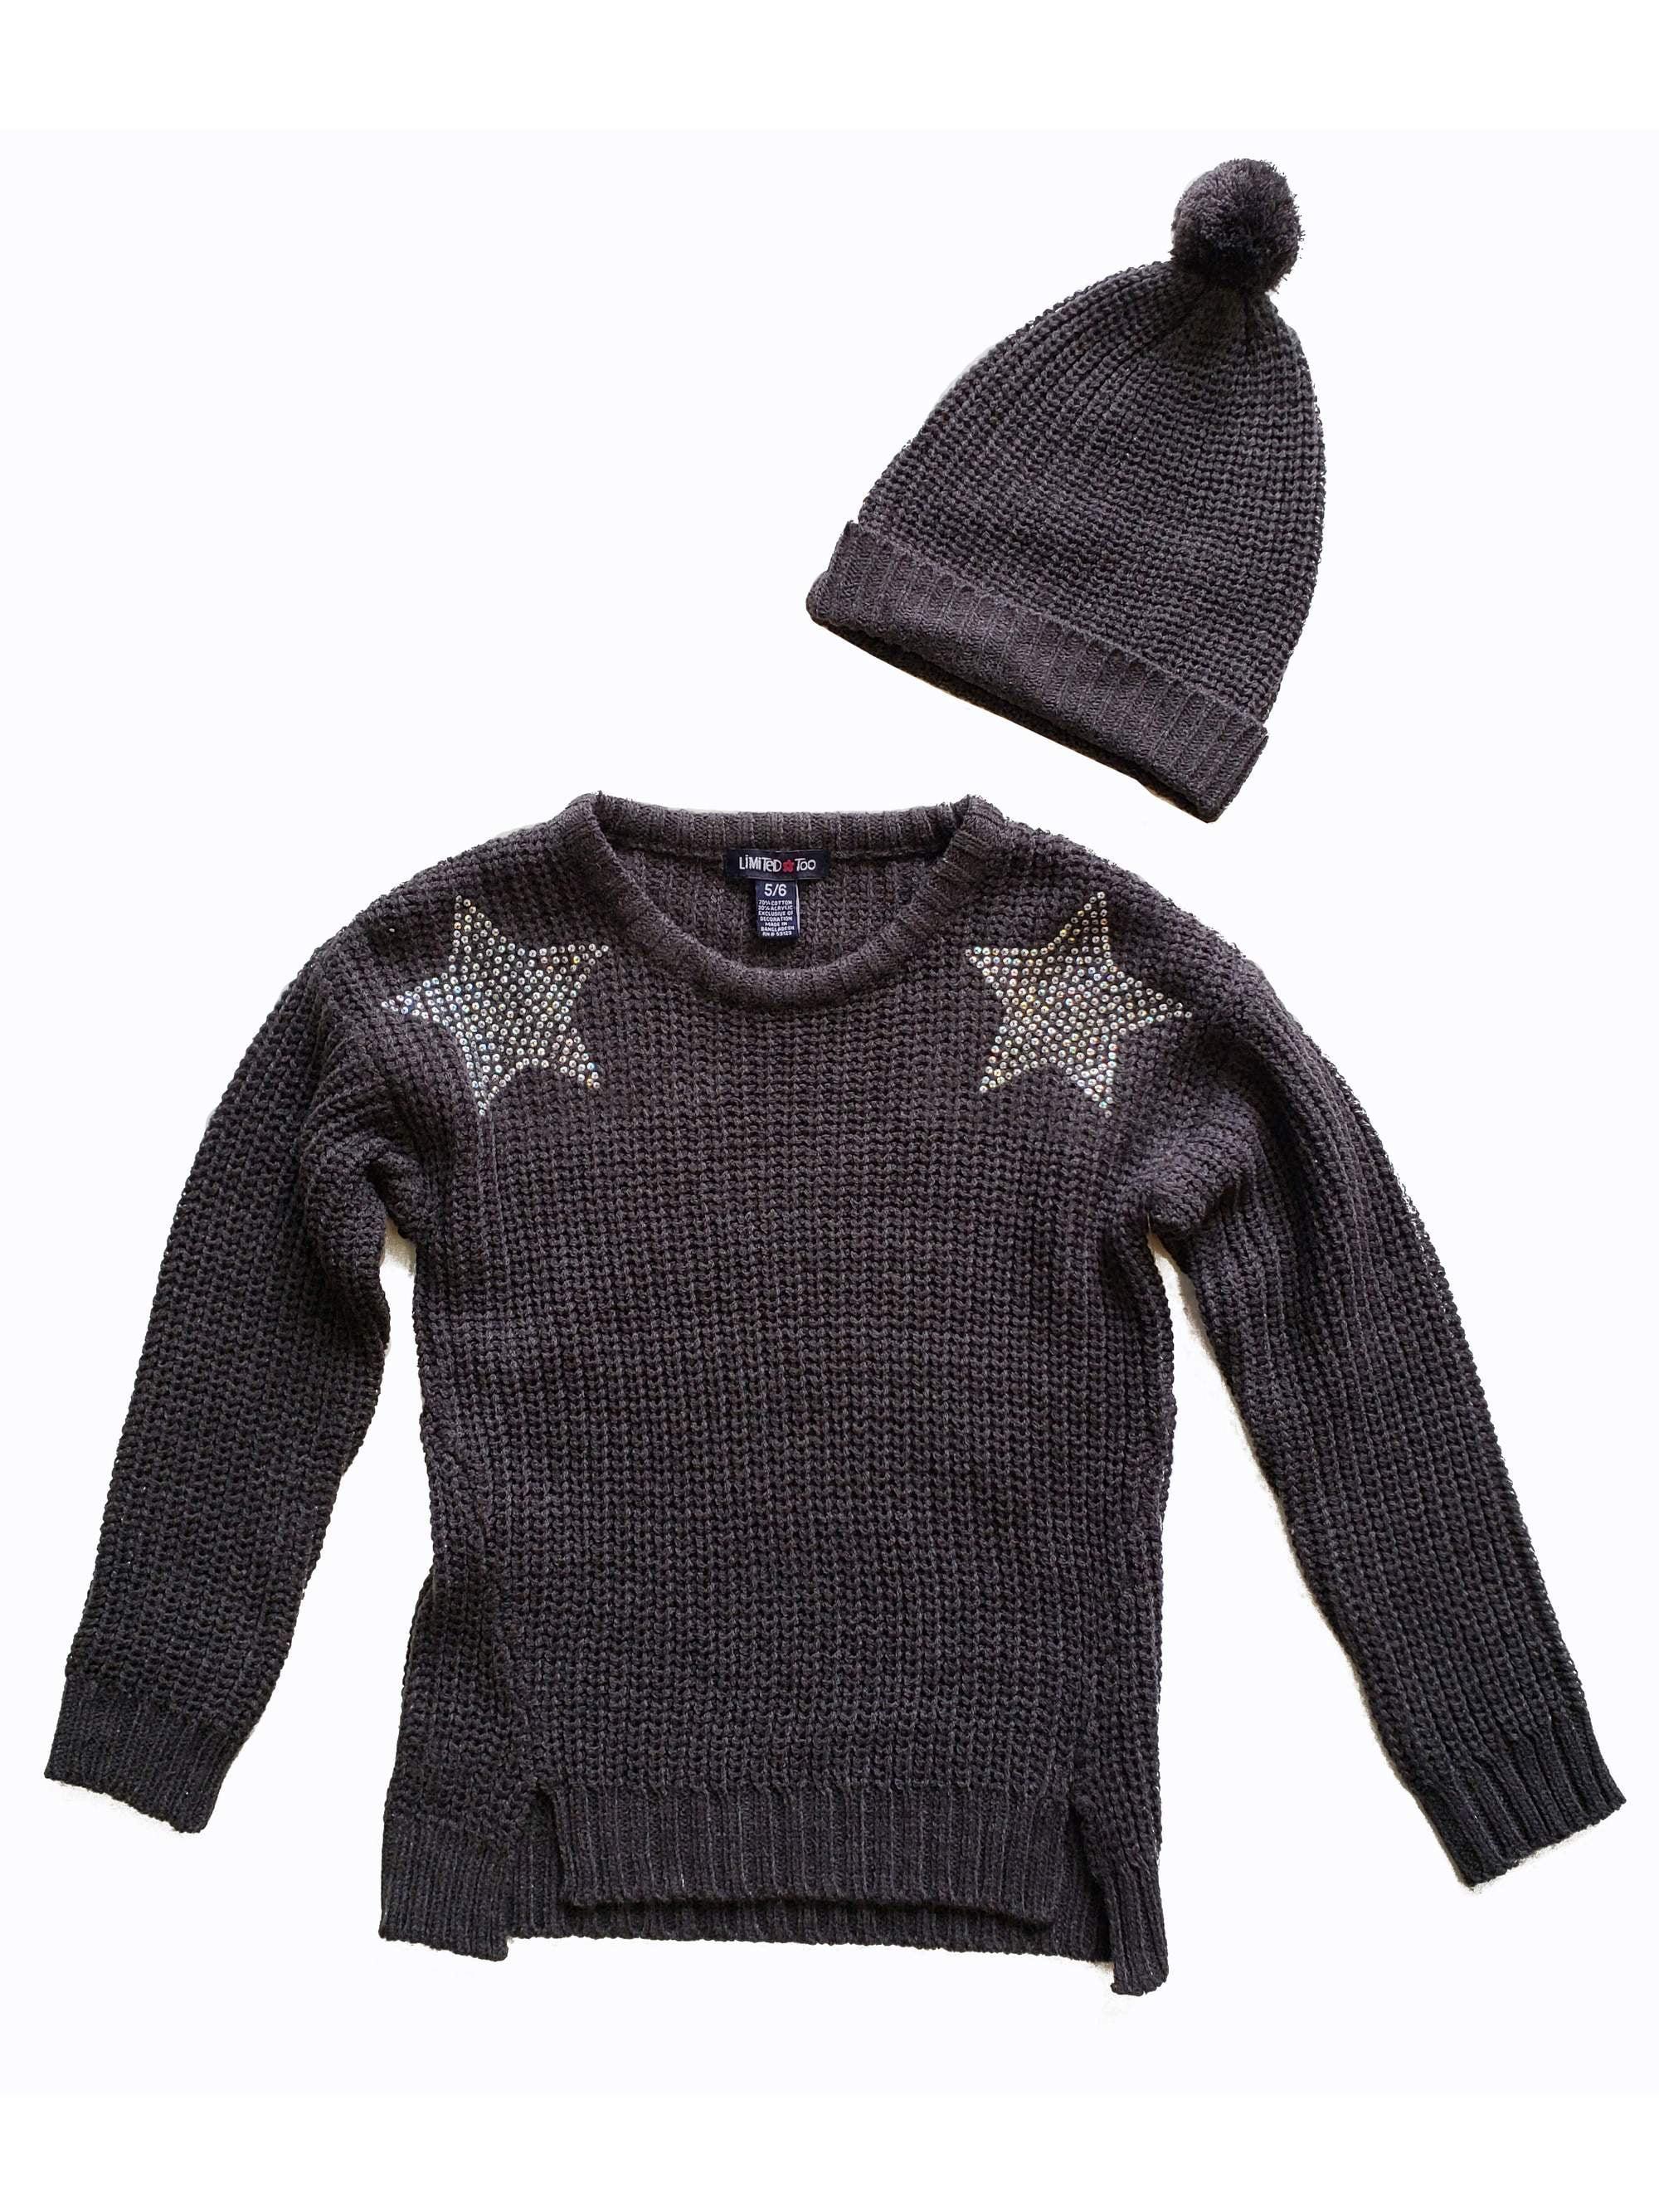 Sweater Hat Set